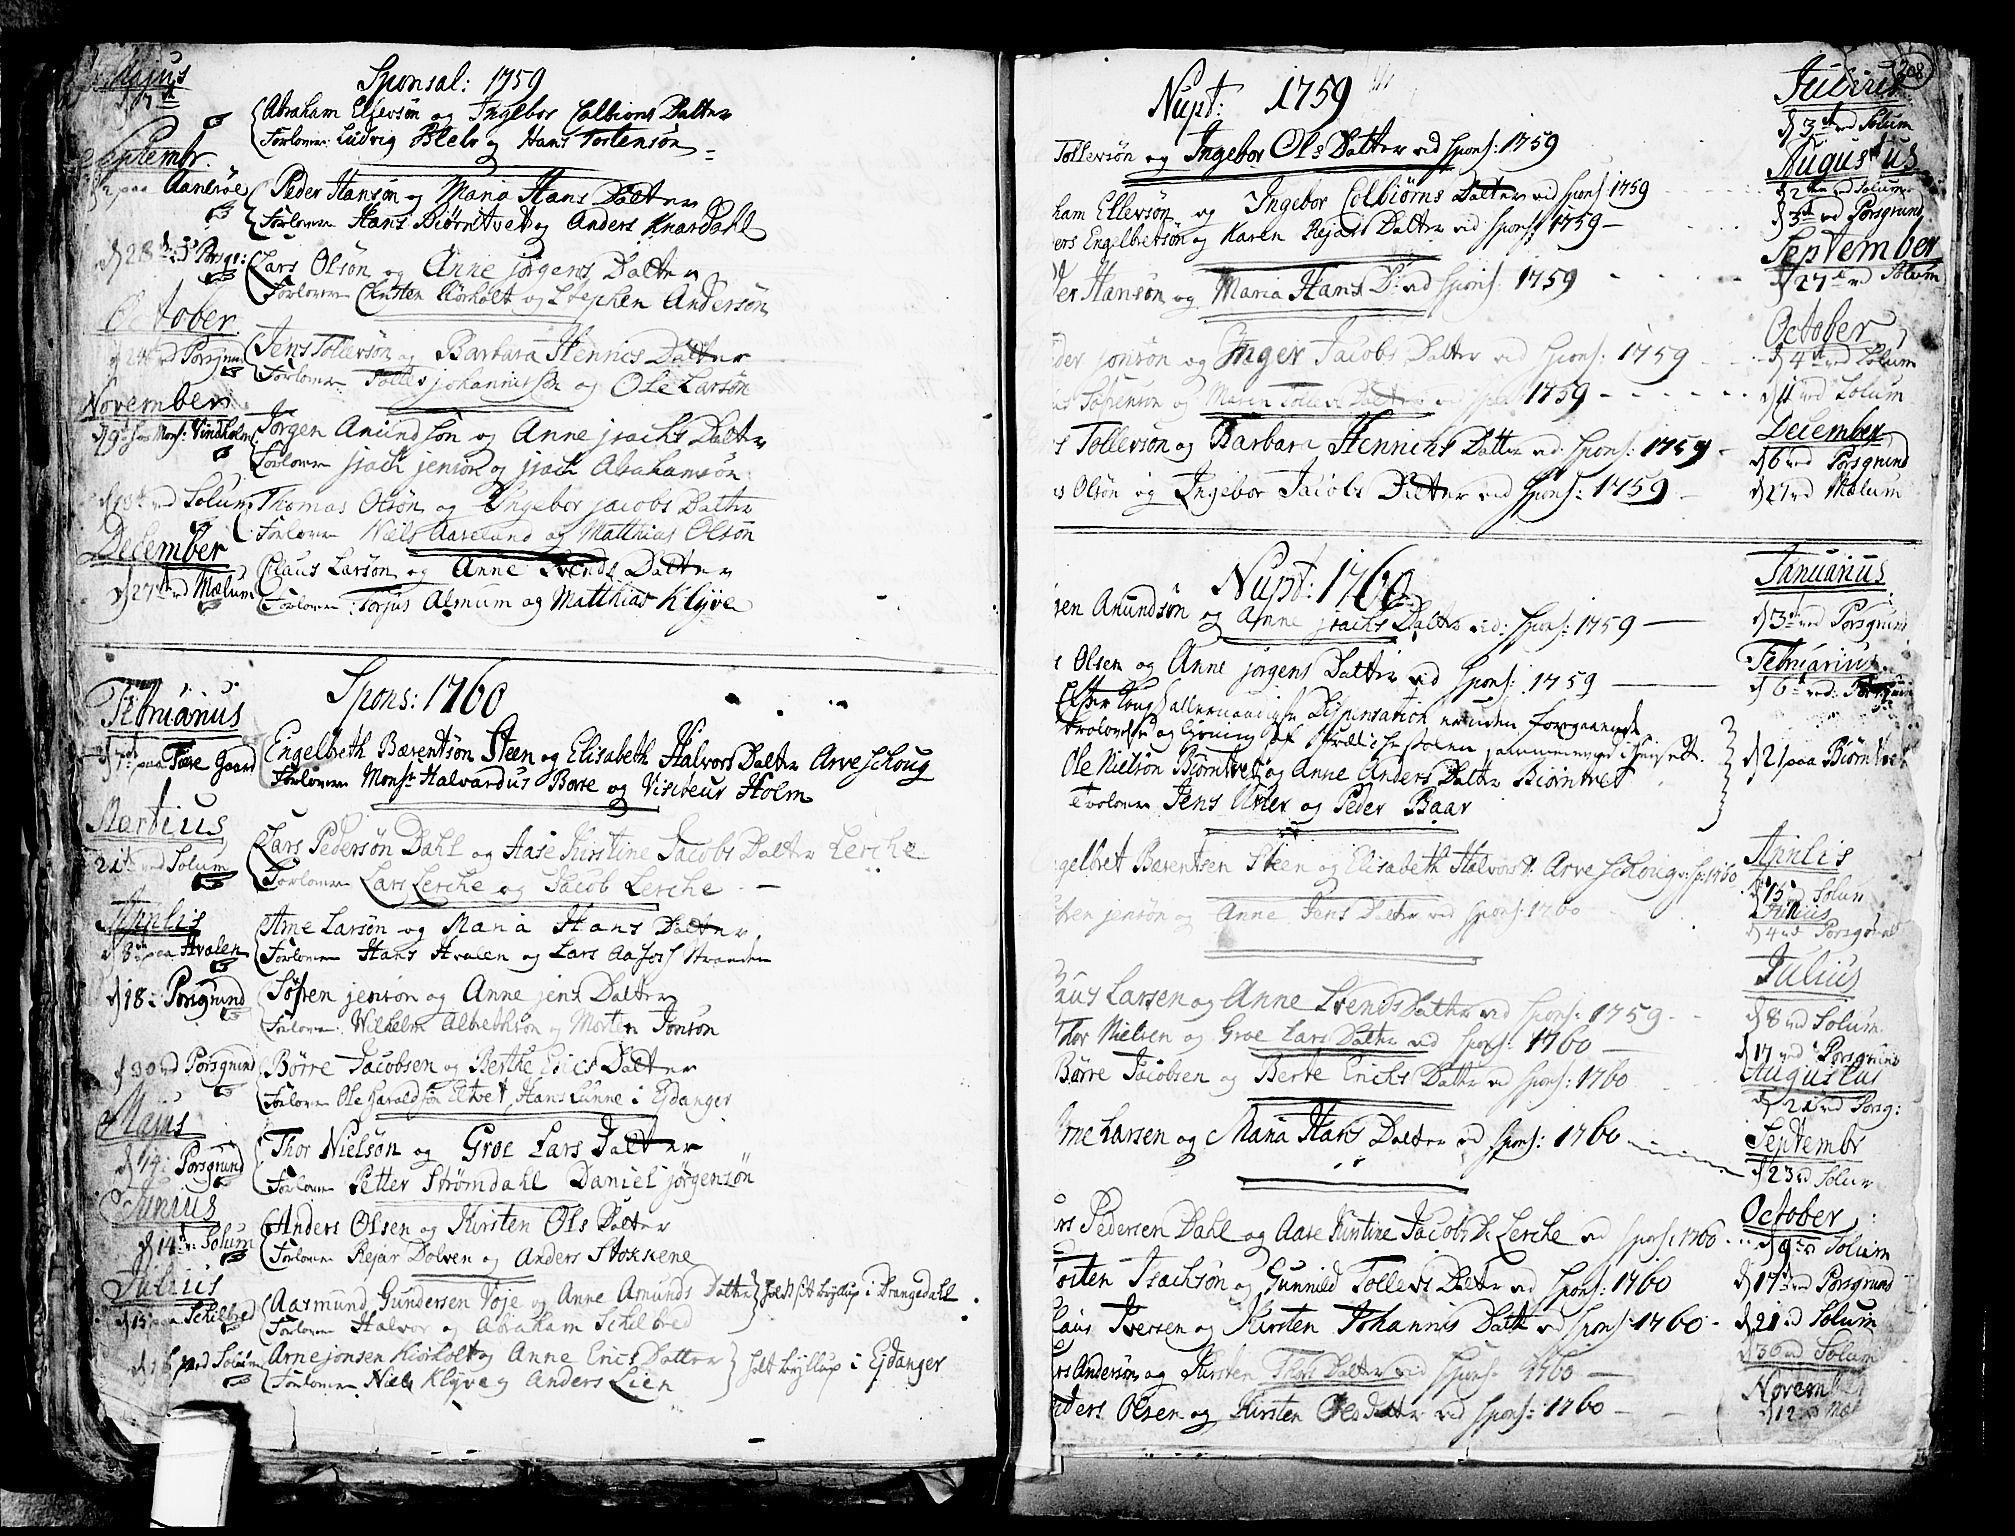 SAKO, Solum kirkebøker, F/Fa/L0002: Ministerialbok nr. I 2, 1713-1761, s. 208